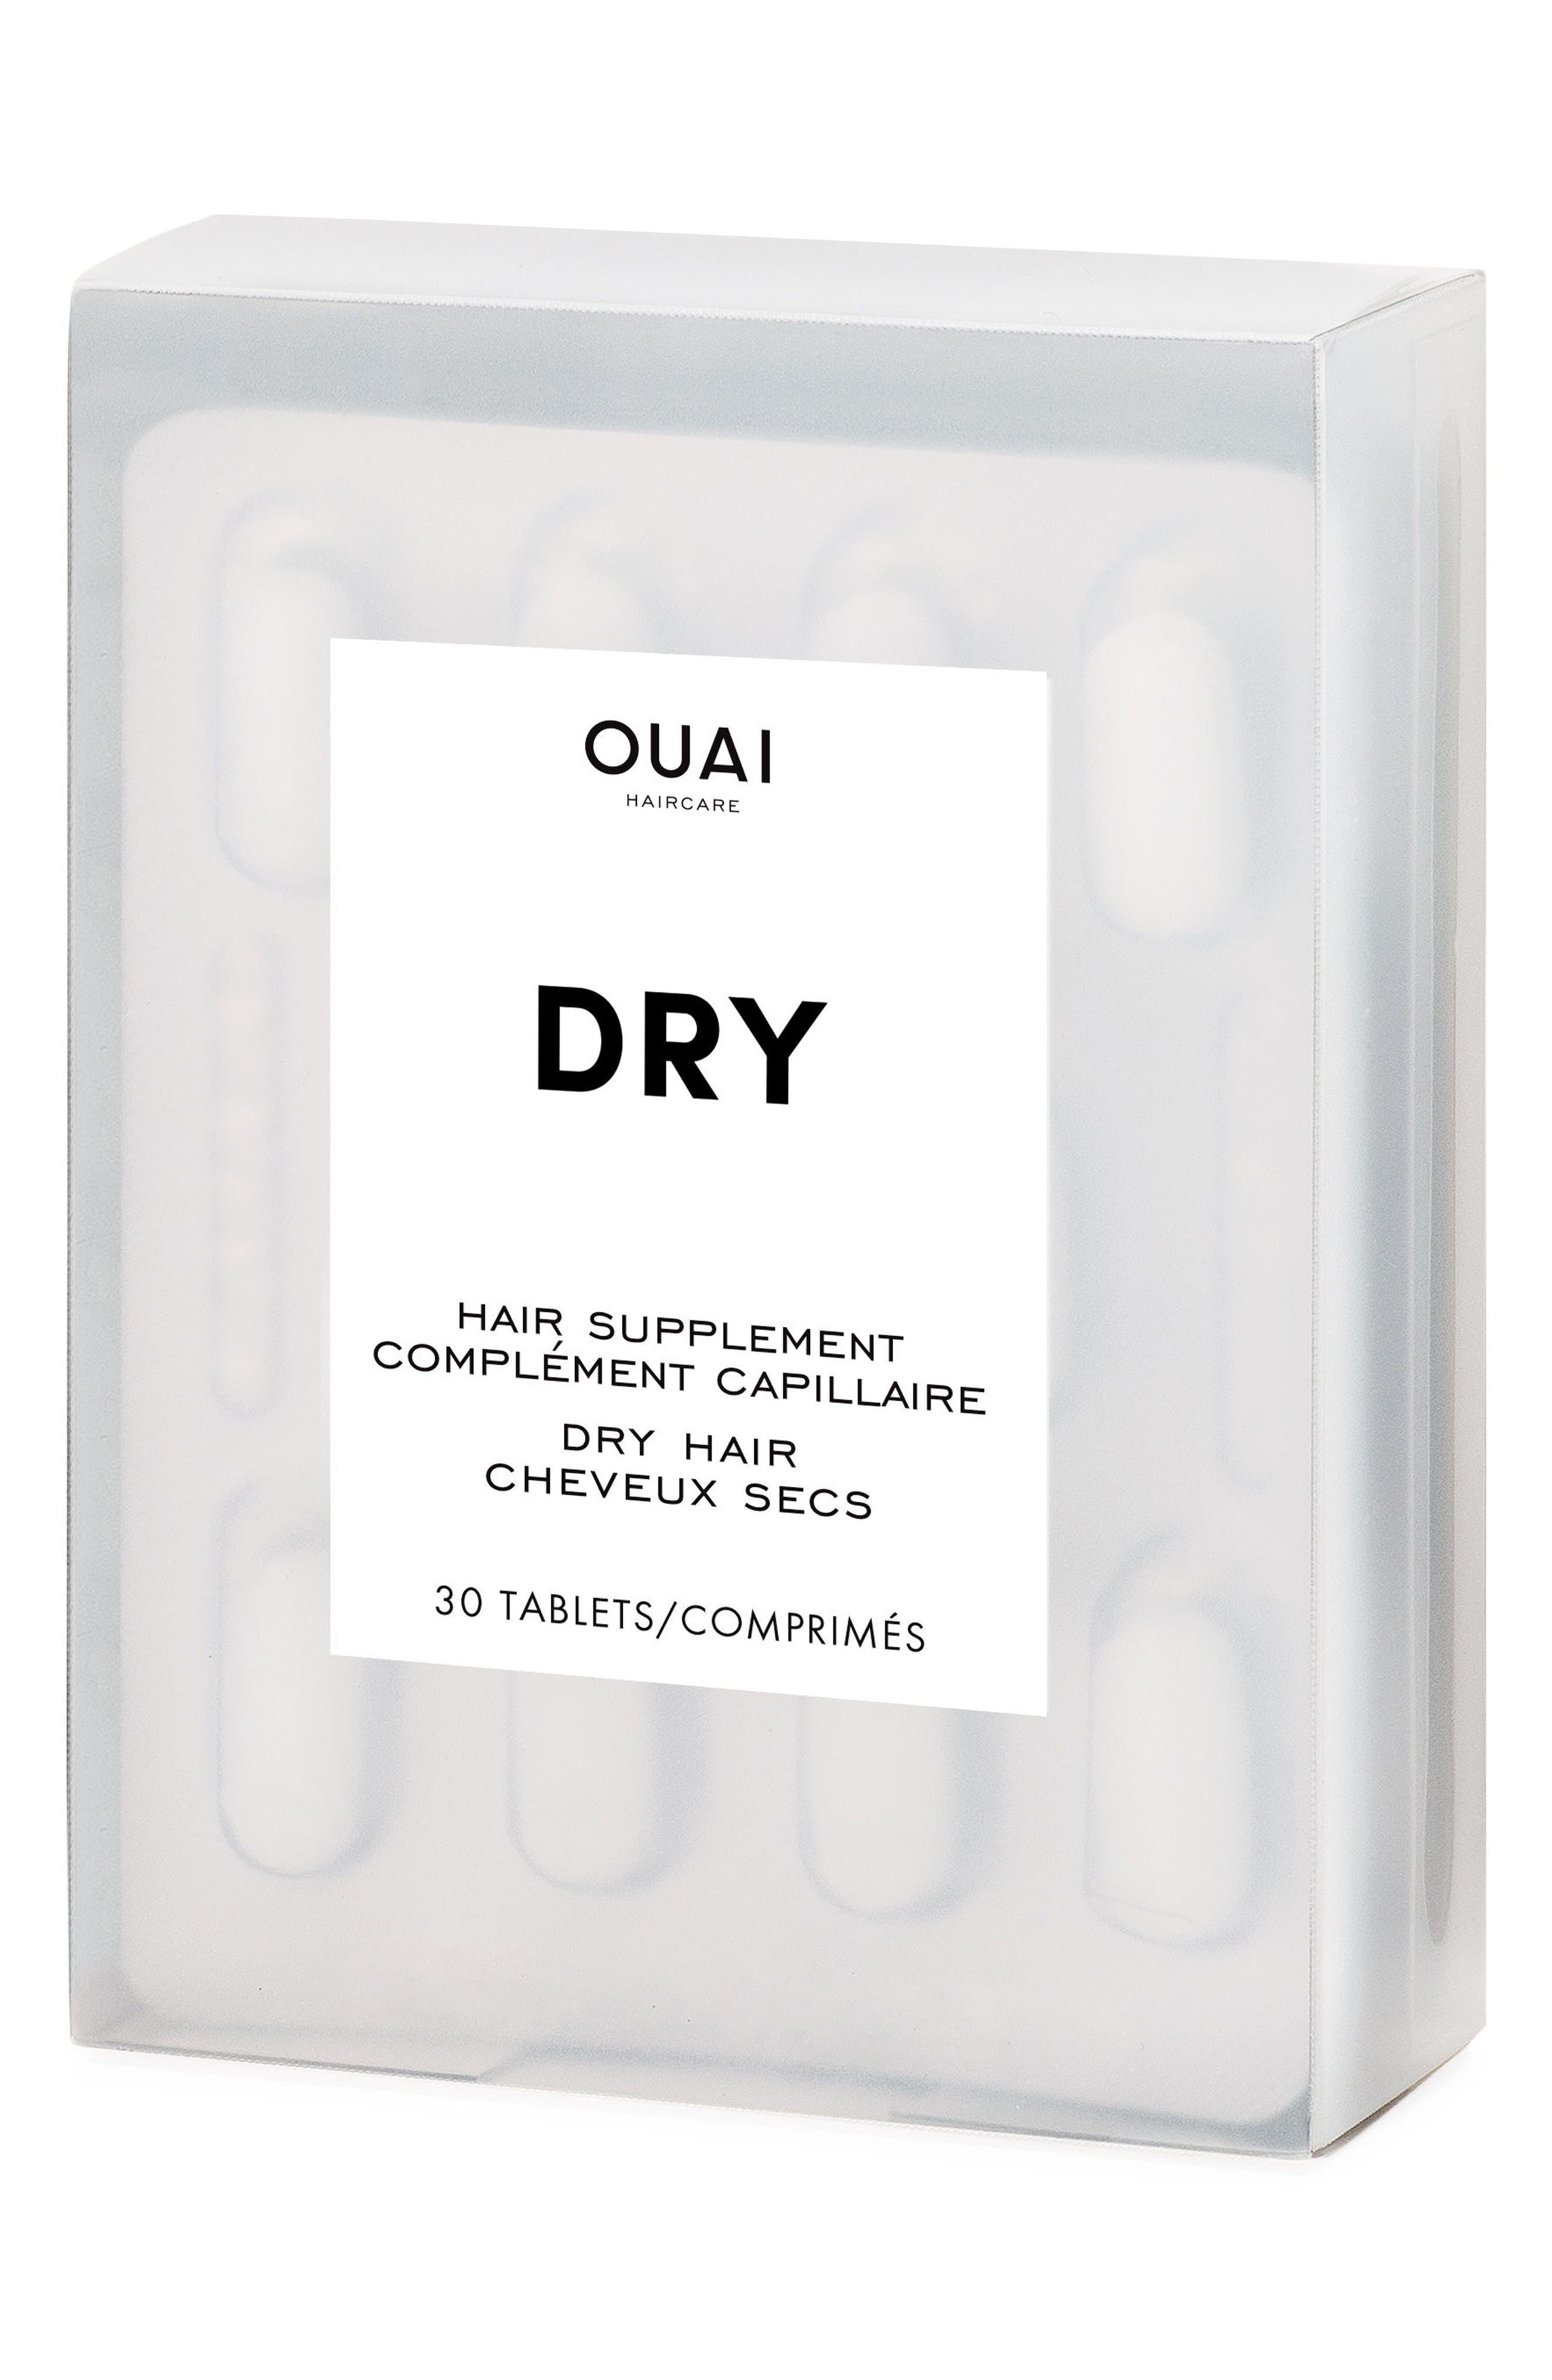 OUAI Dry Hair Supplements